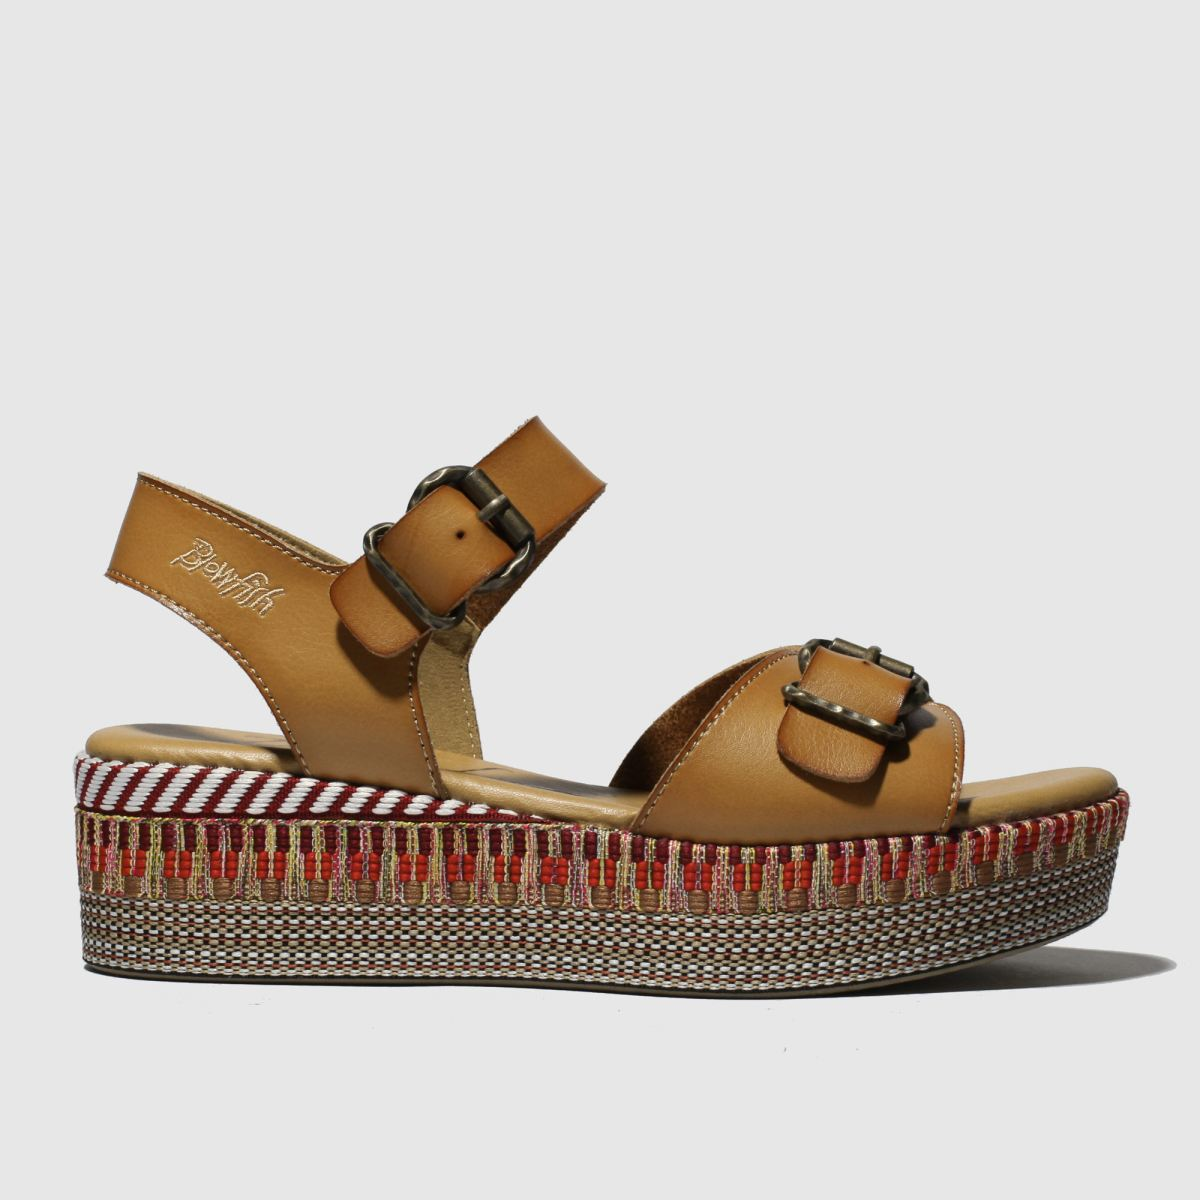 Blowfish Tan Leeds B Sandals